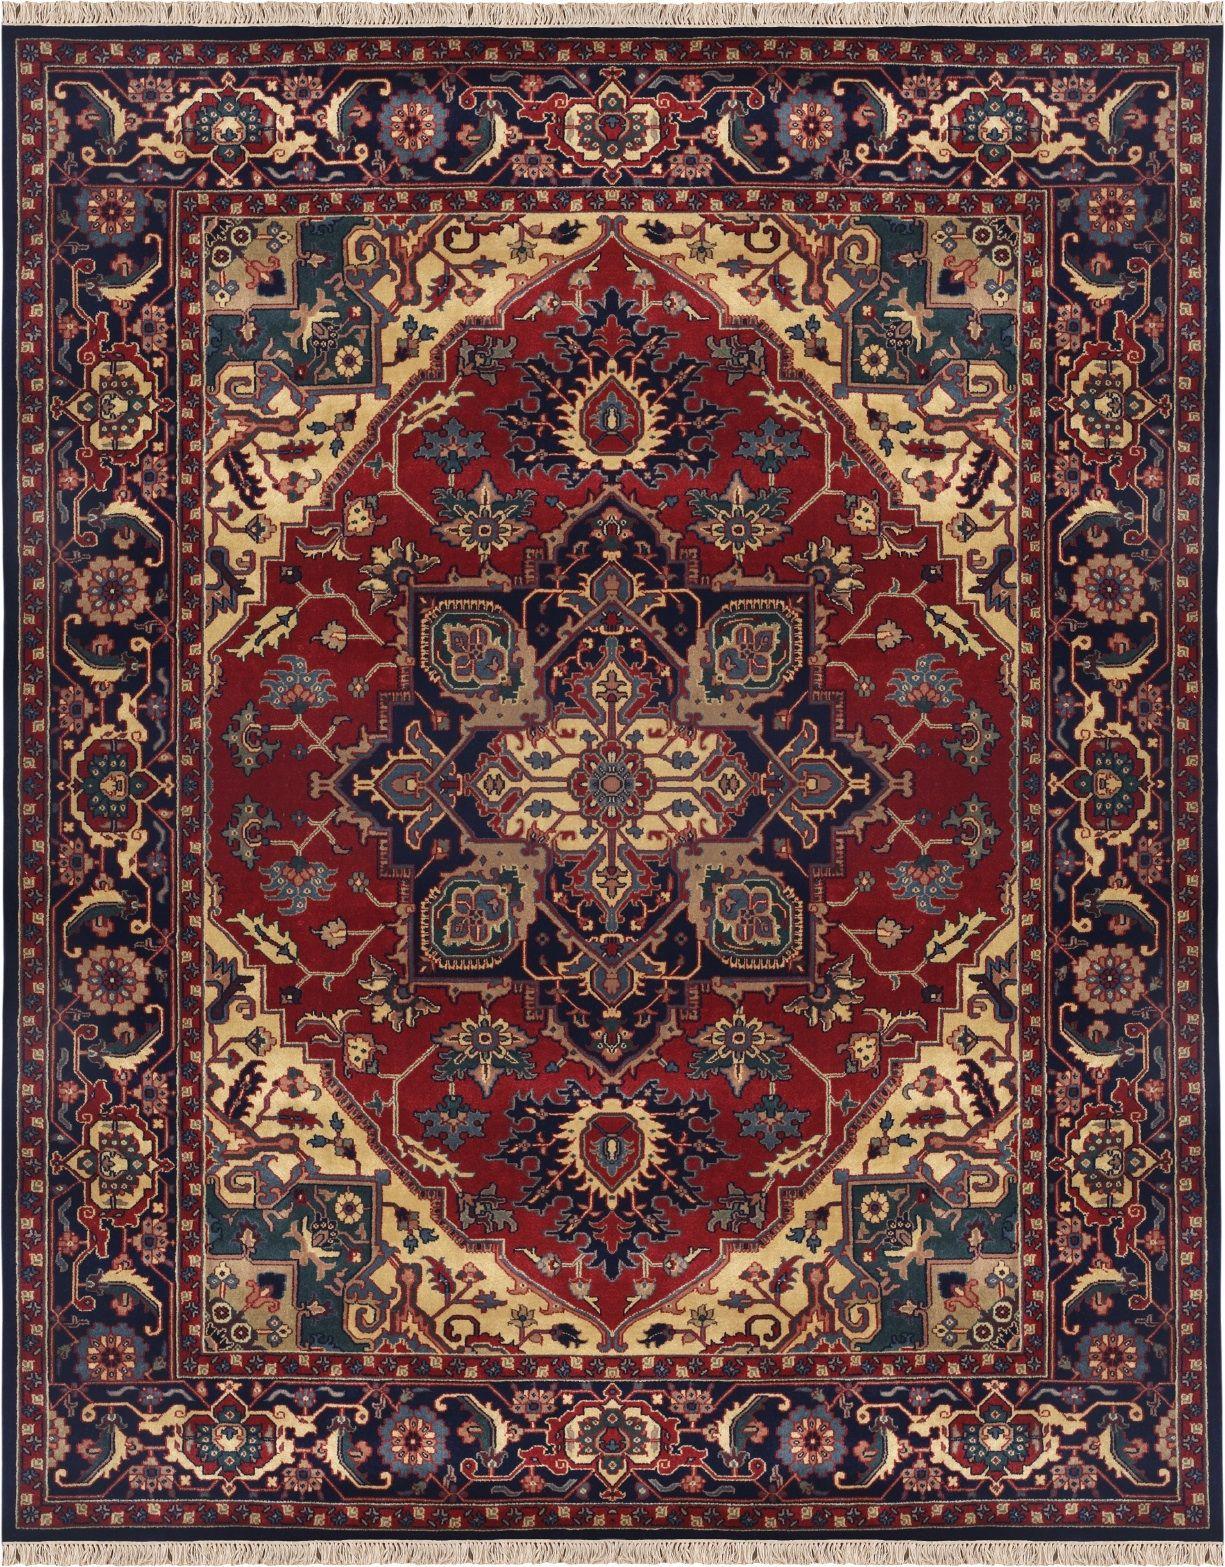 Stylish The Big Lebowski Rug Homey Inspiration Fun With Rugs Lone Girl In A Crowd Imgbb Com Rugs Persian Rug Oriental Rug